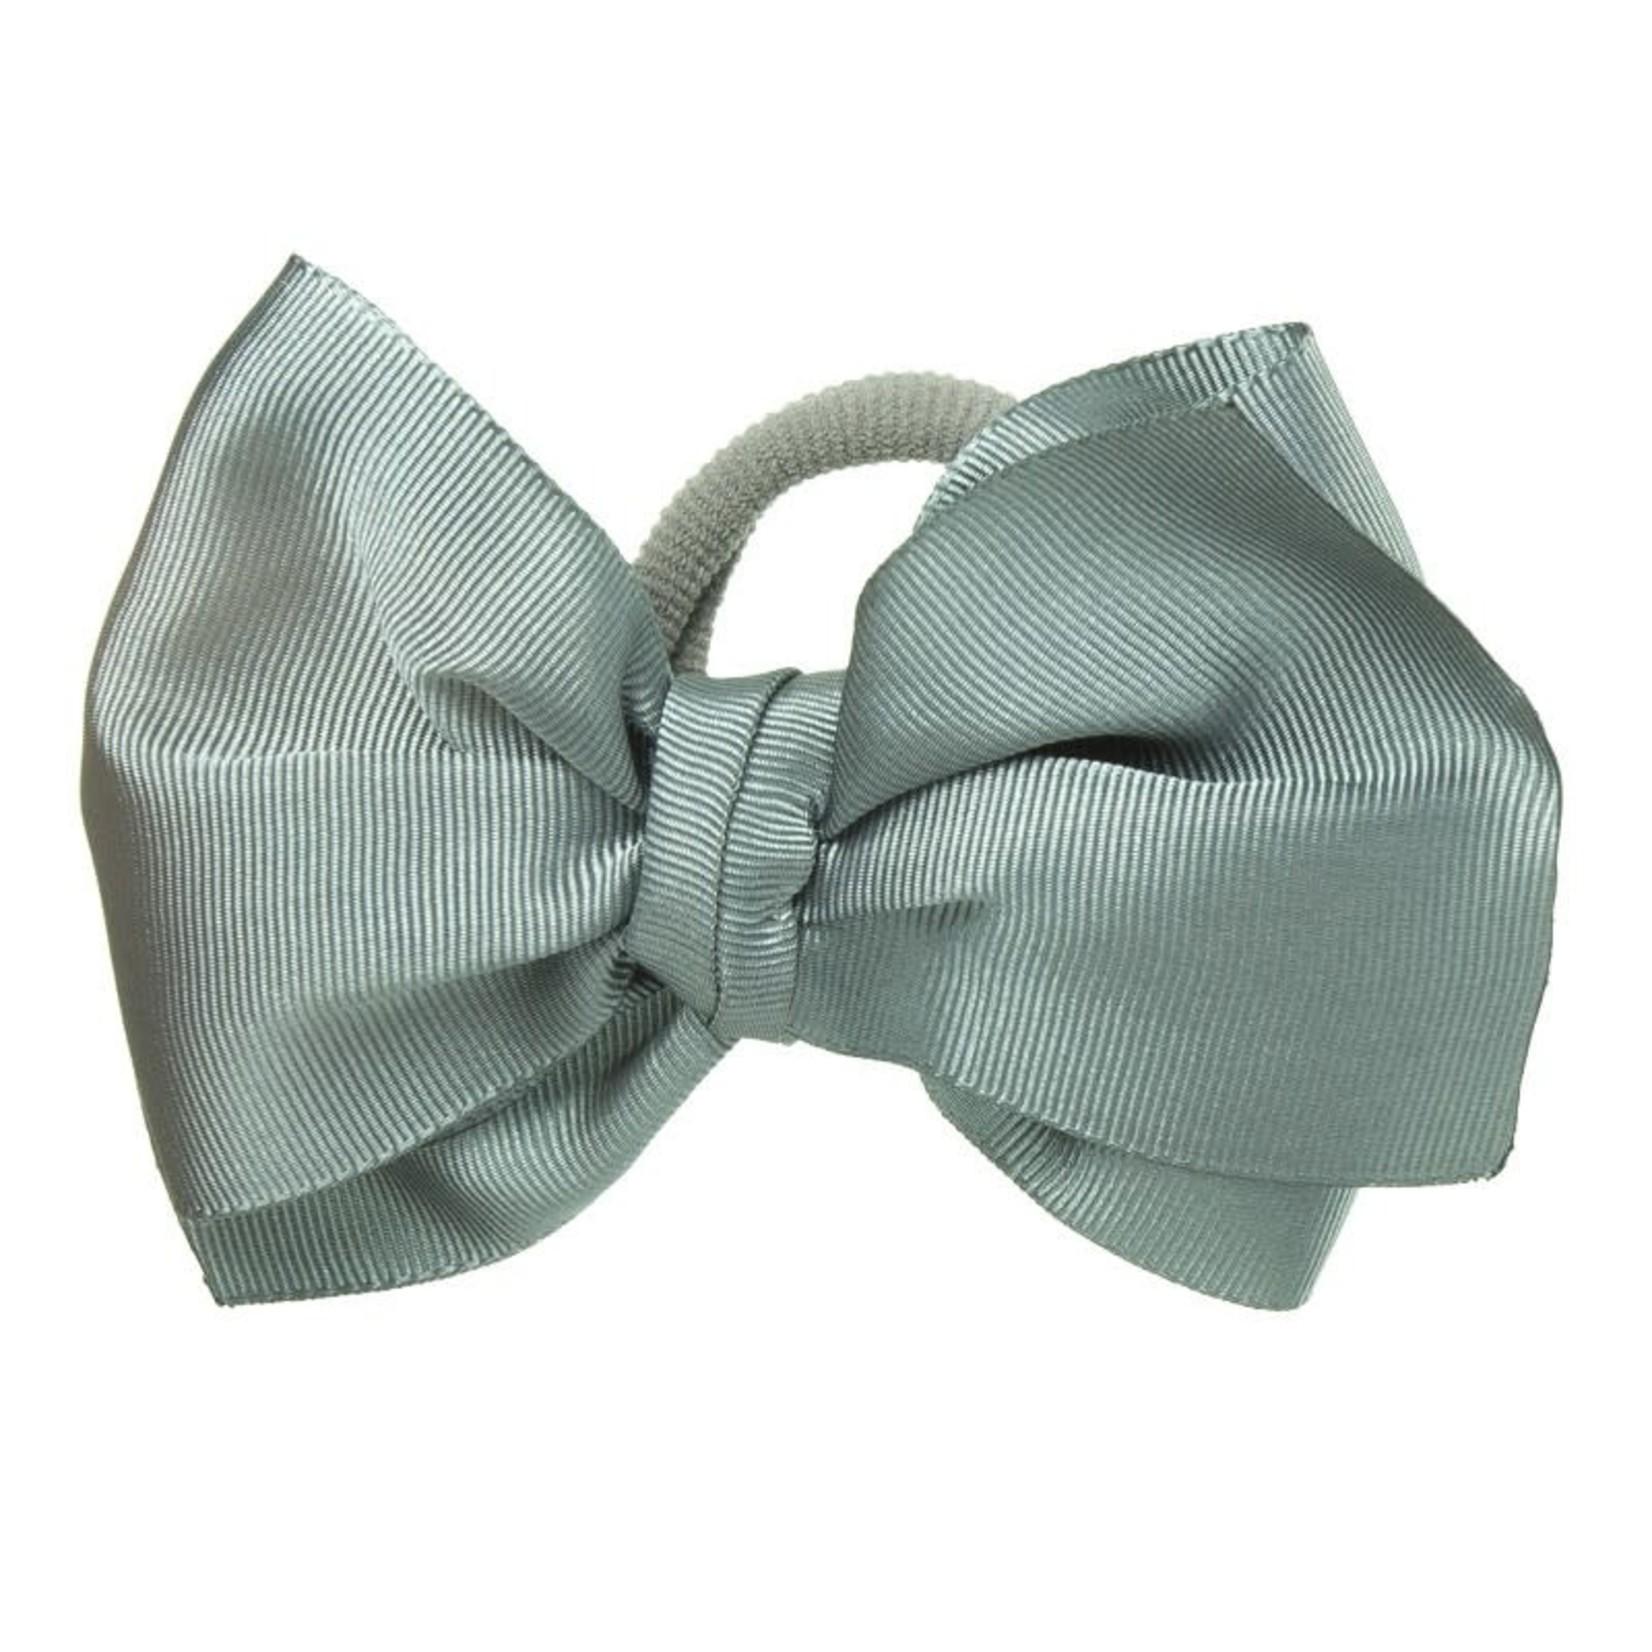 Siena Copy of Hair Bow - Blue Gray